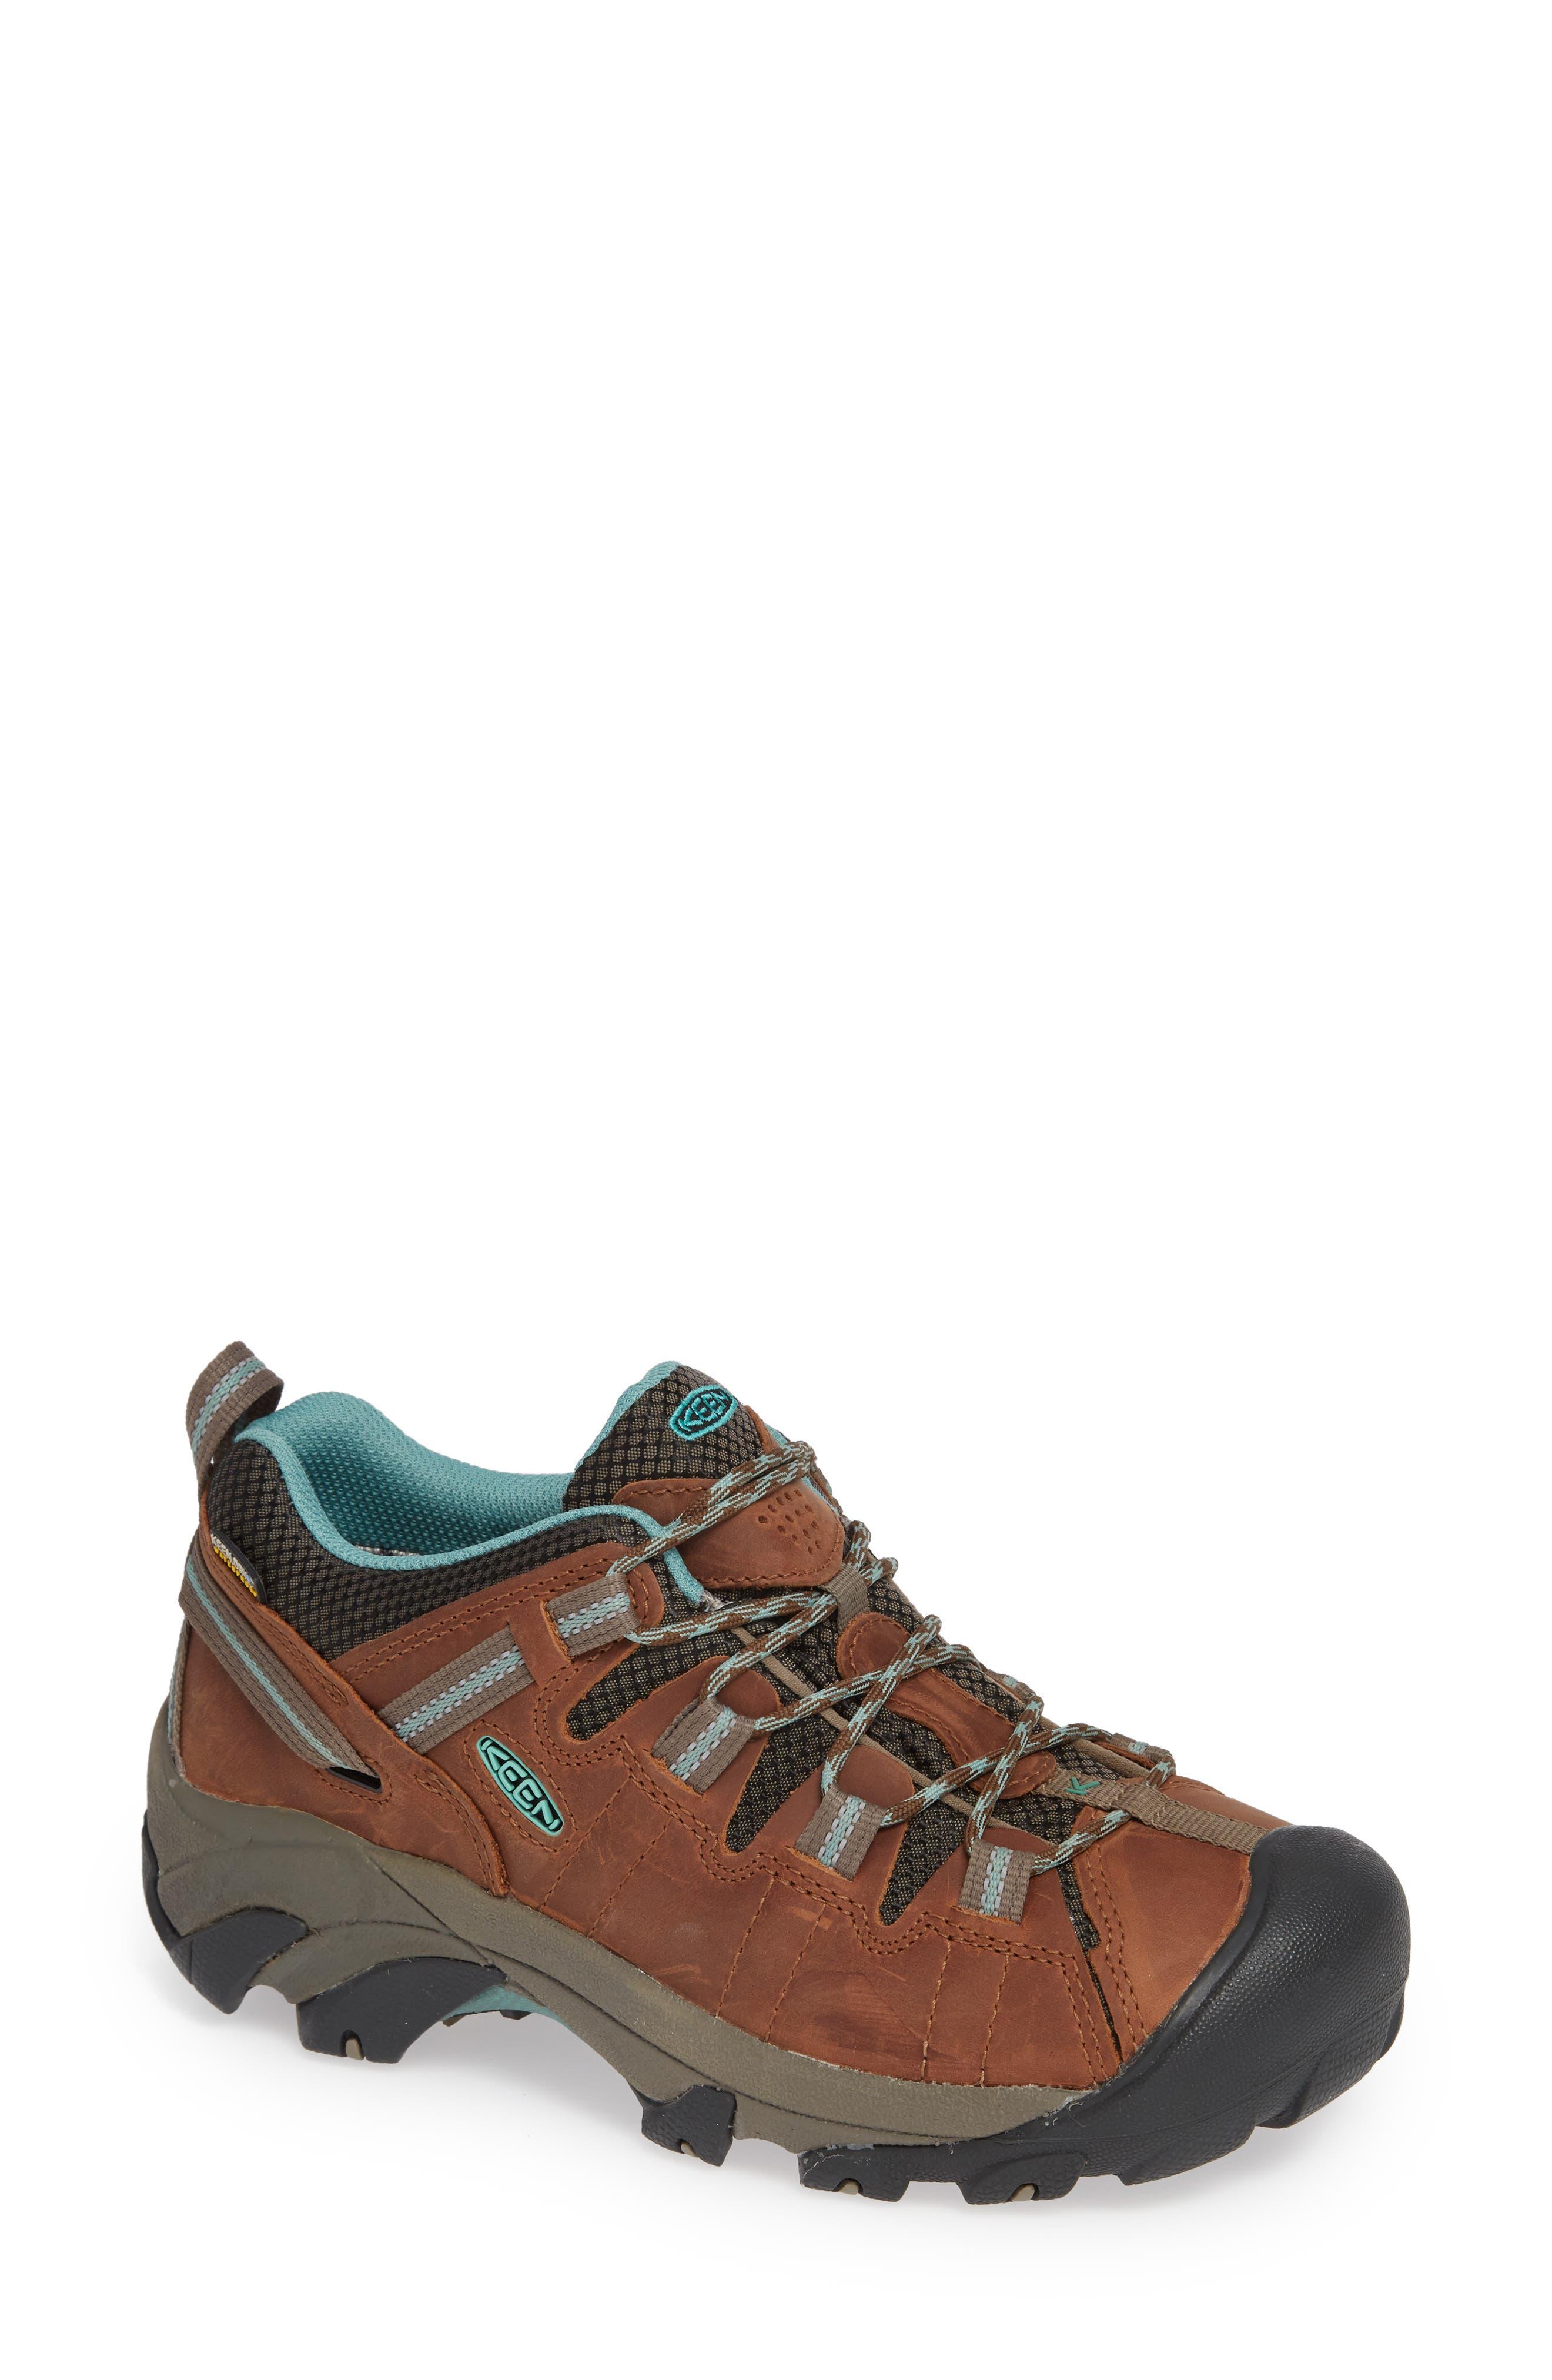 'Targhee II' Walking Shoe,                             Main thumbnail 1, color,                             Dark Earth/ Wasabi Nubuck